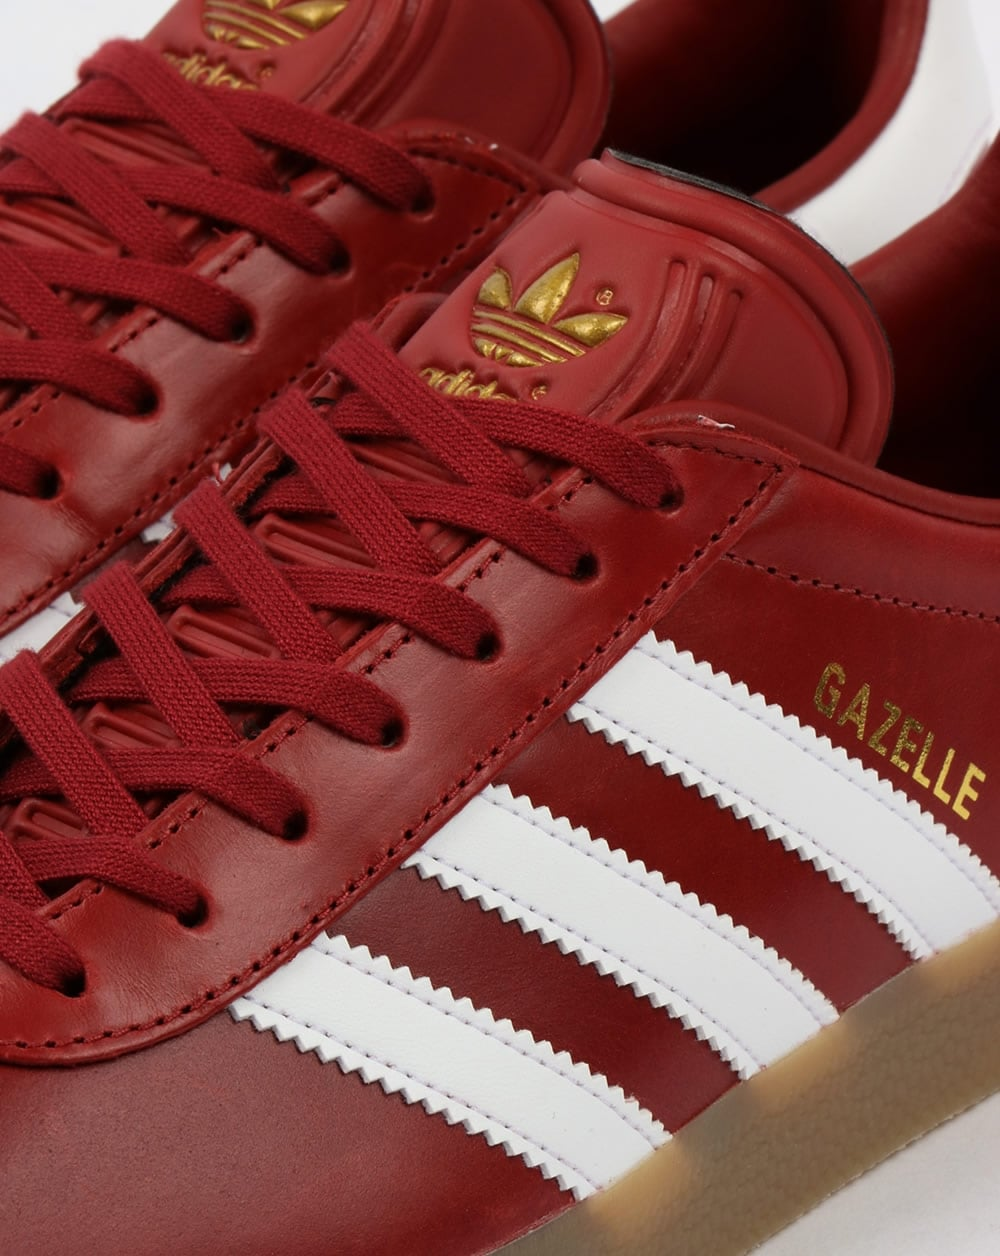 separation shoes b0494 3b77f Adidas Gazelle Leather Trainers Oxblood RedWhitegum